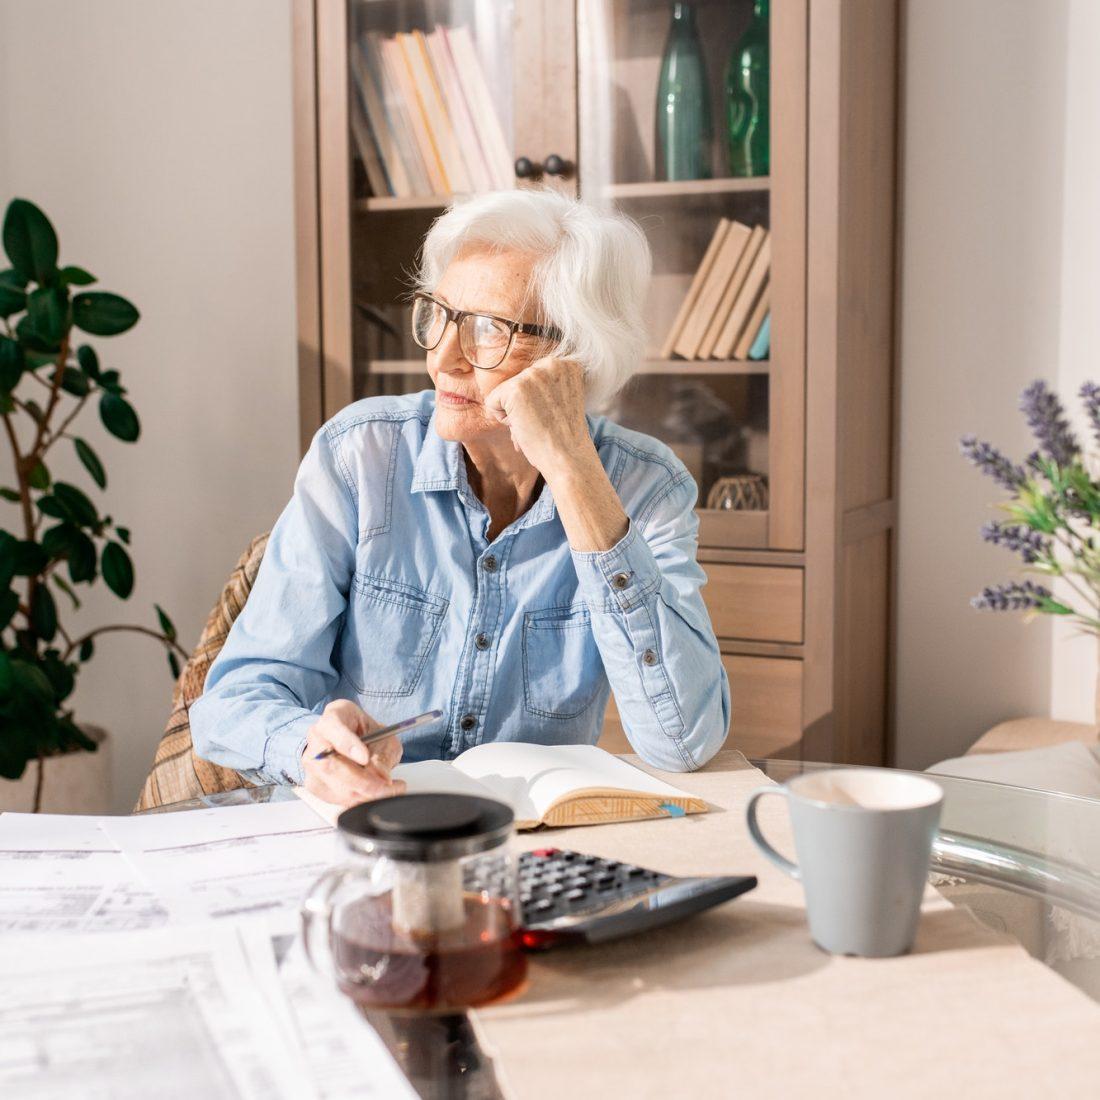 Pensive Senior Woman Counting Taxes